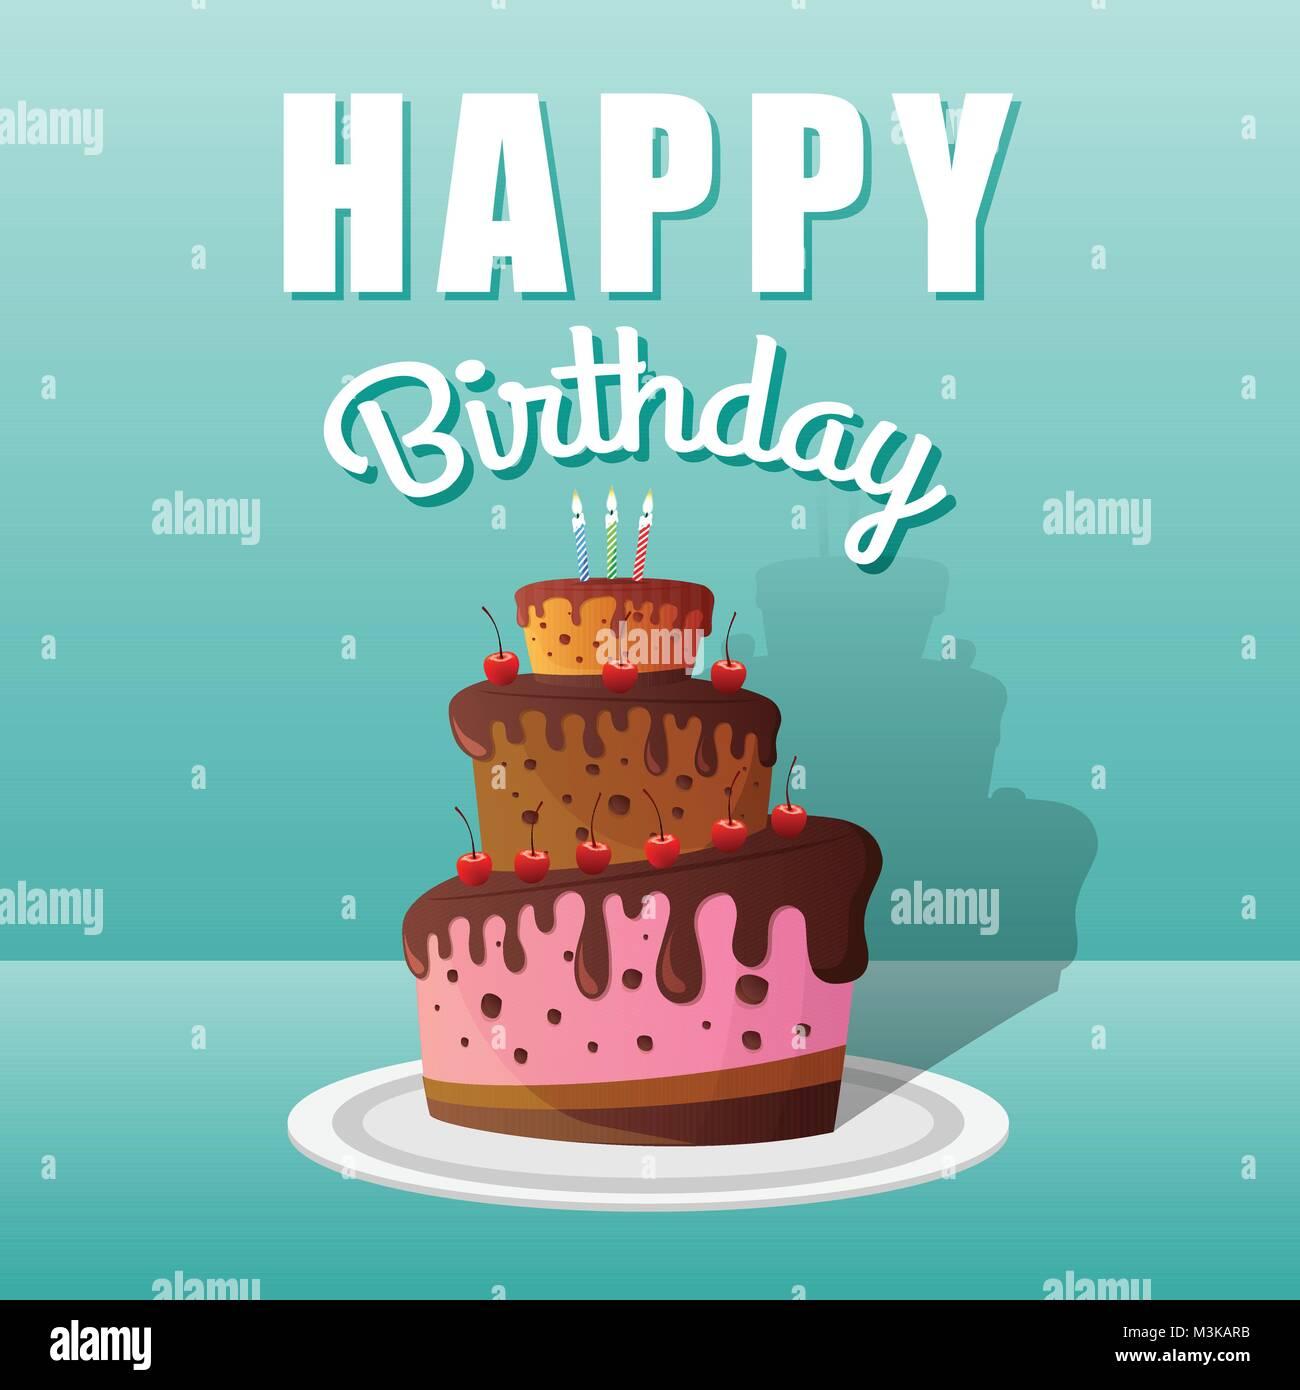 Happy birthday greeting cards design with chocolate cakes and stock happy birthday greeting cards design with chocolate cakes and candles vector illustration m4hsunfo